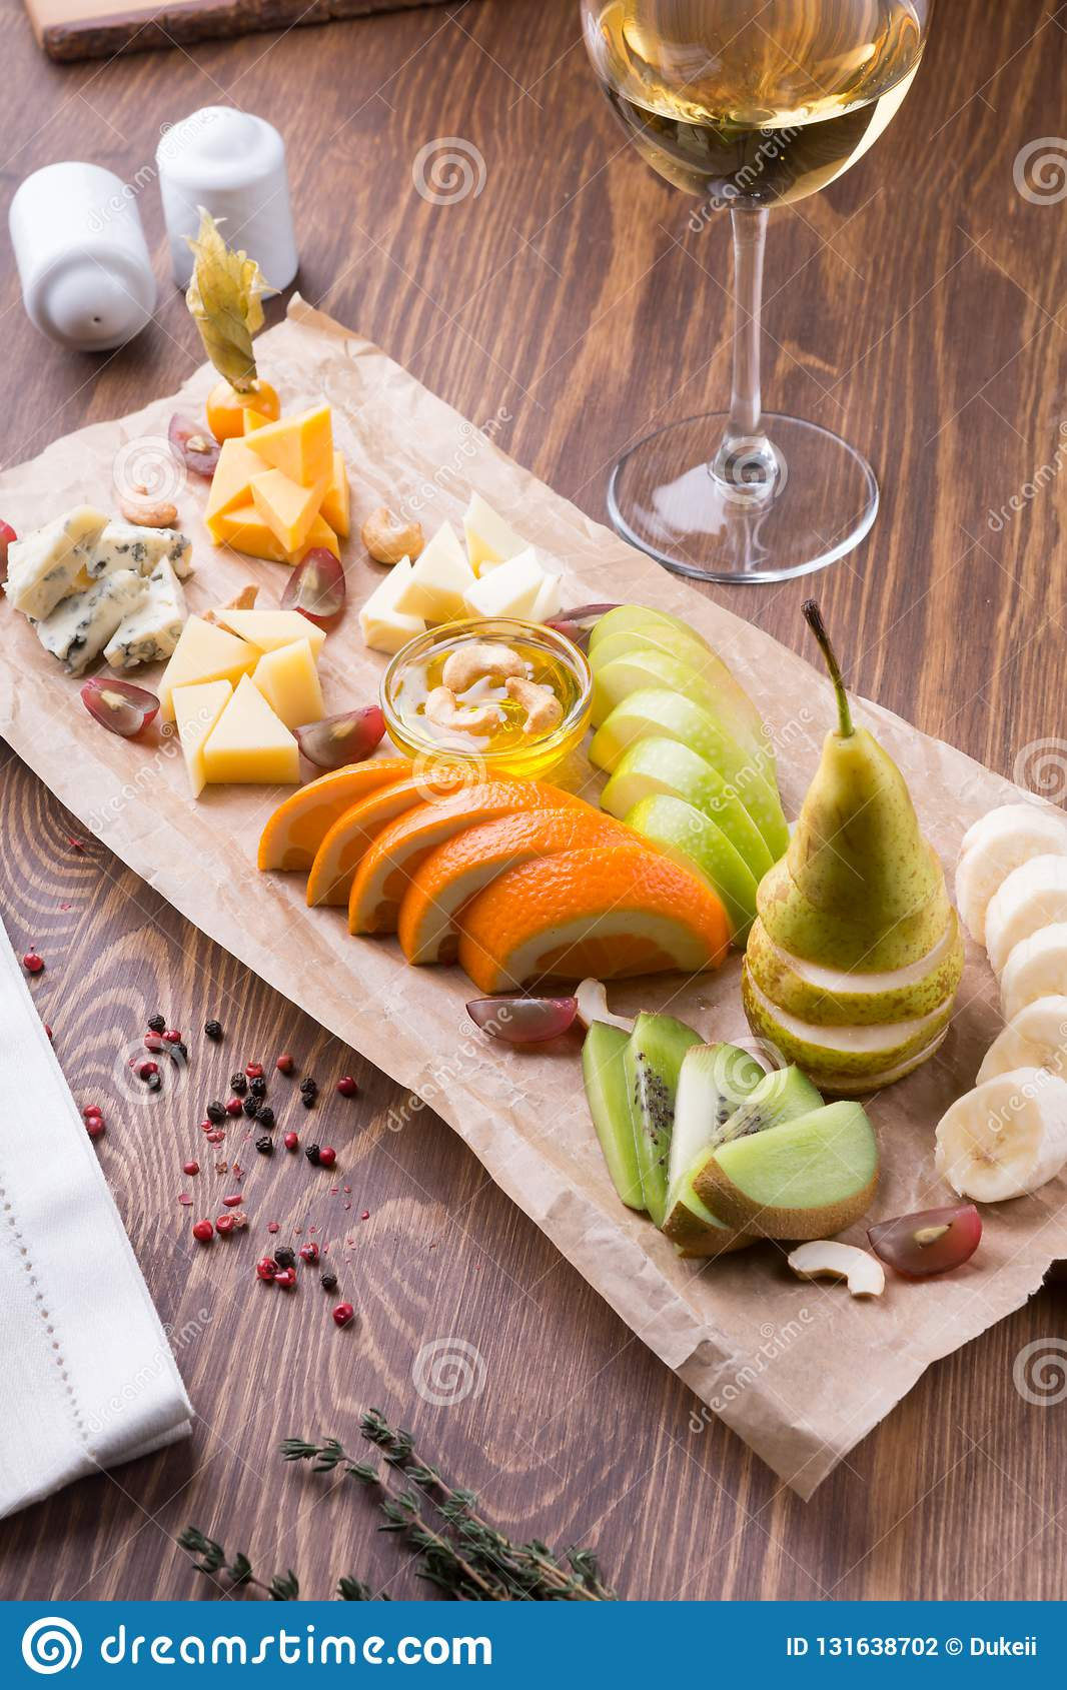 Fruit Platter Full Of Snacks For White Wine Served On A Wooden Table Stock Photo Image Of Board Banana 131638702